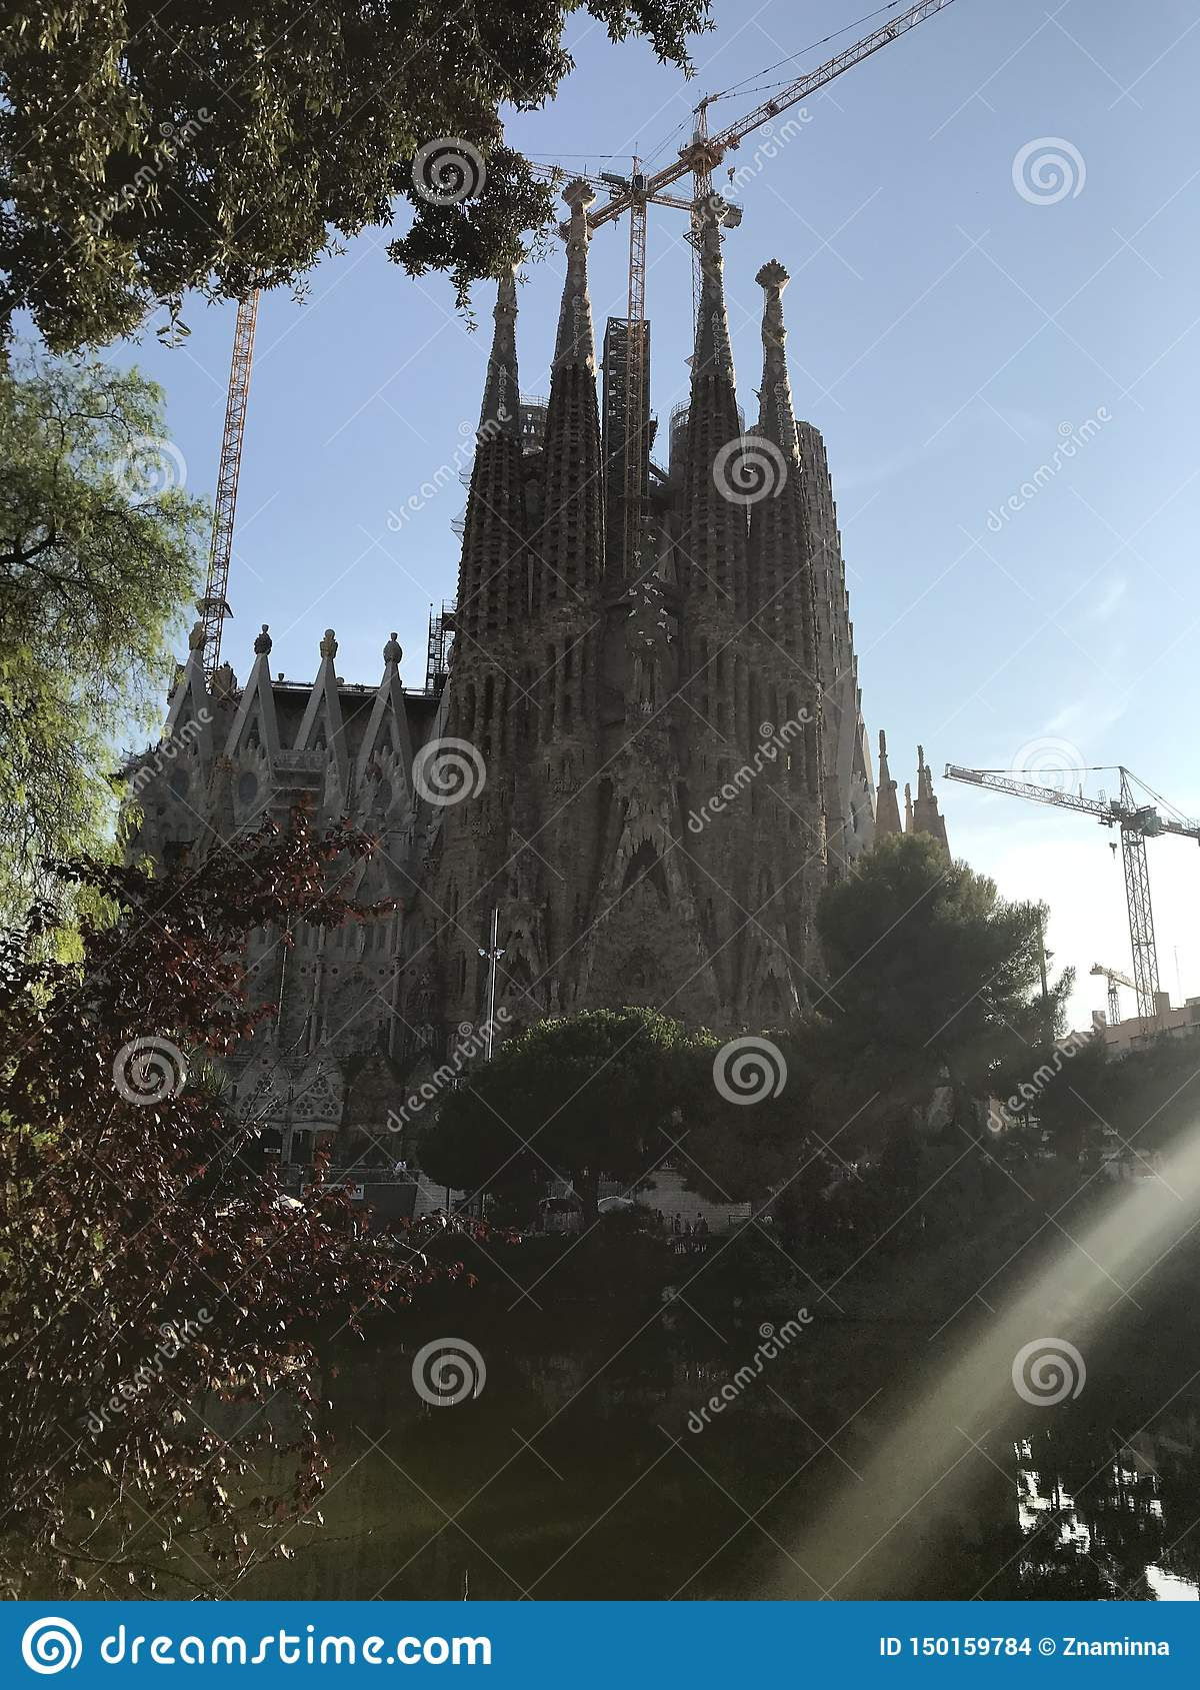 Spain, Europe. Barcelona, Sagrada de Familia